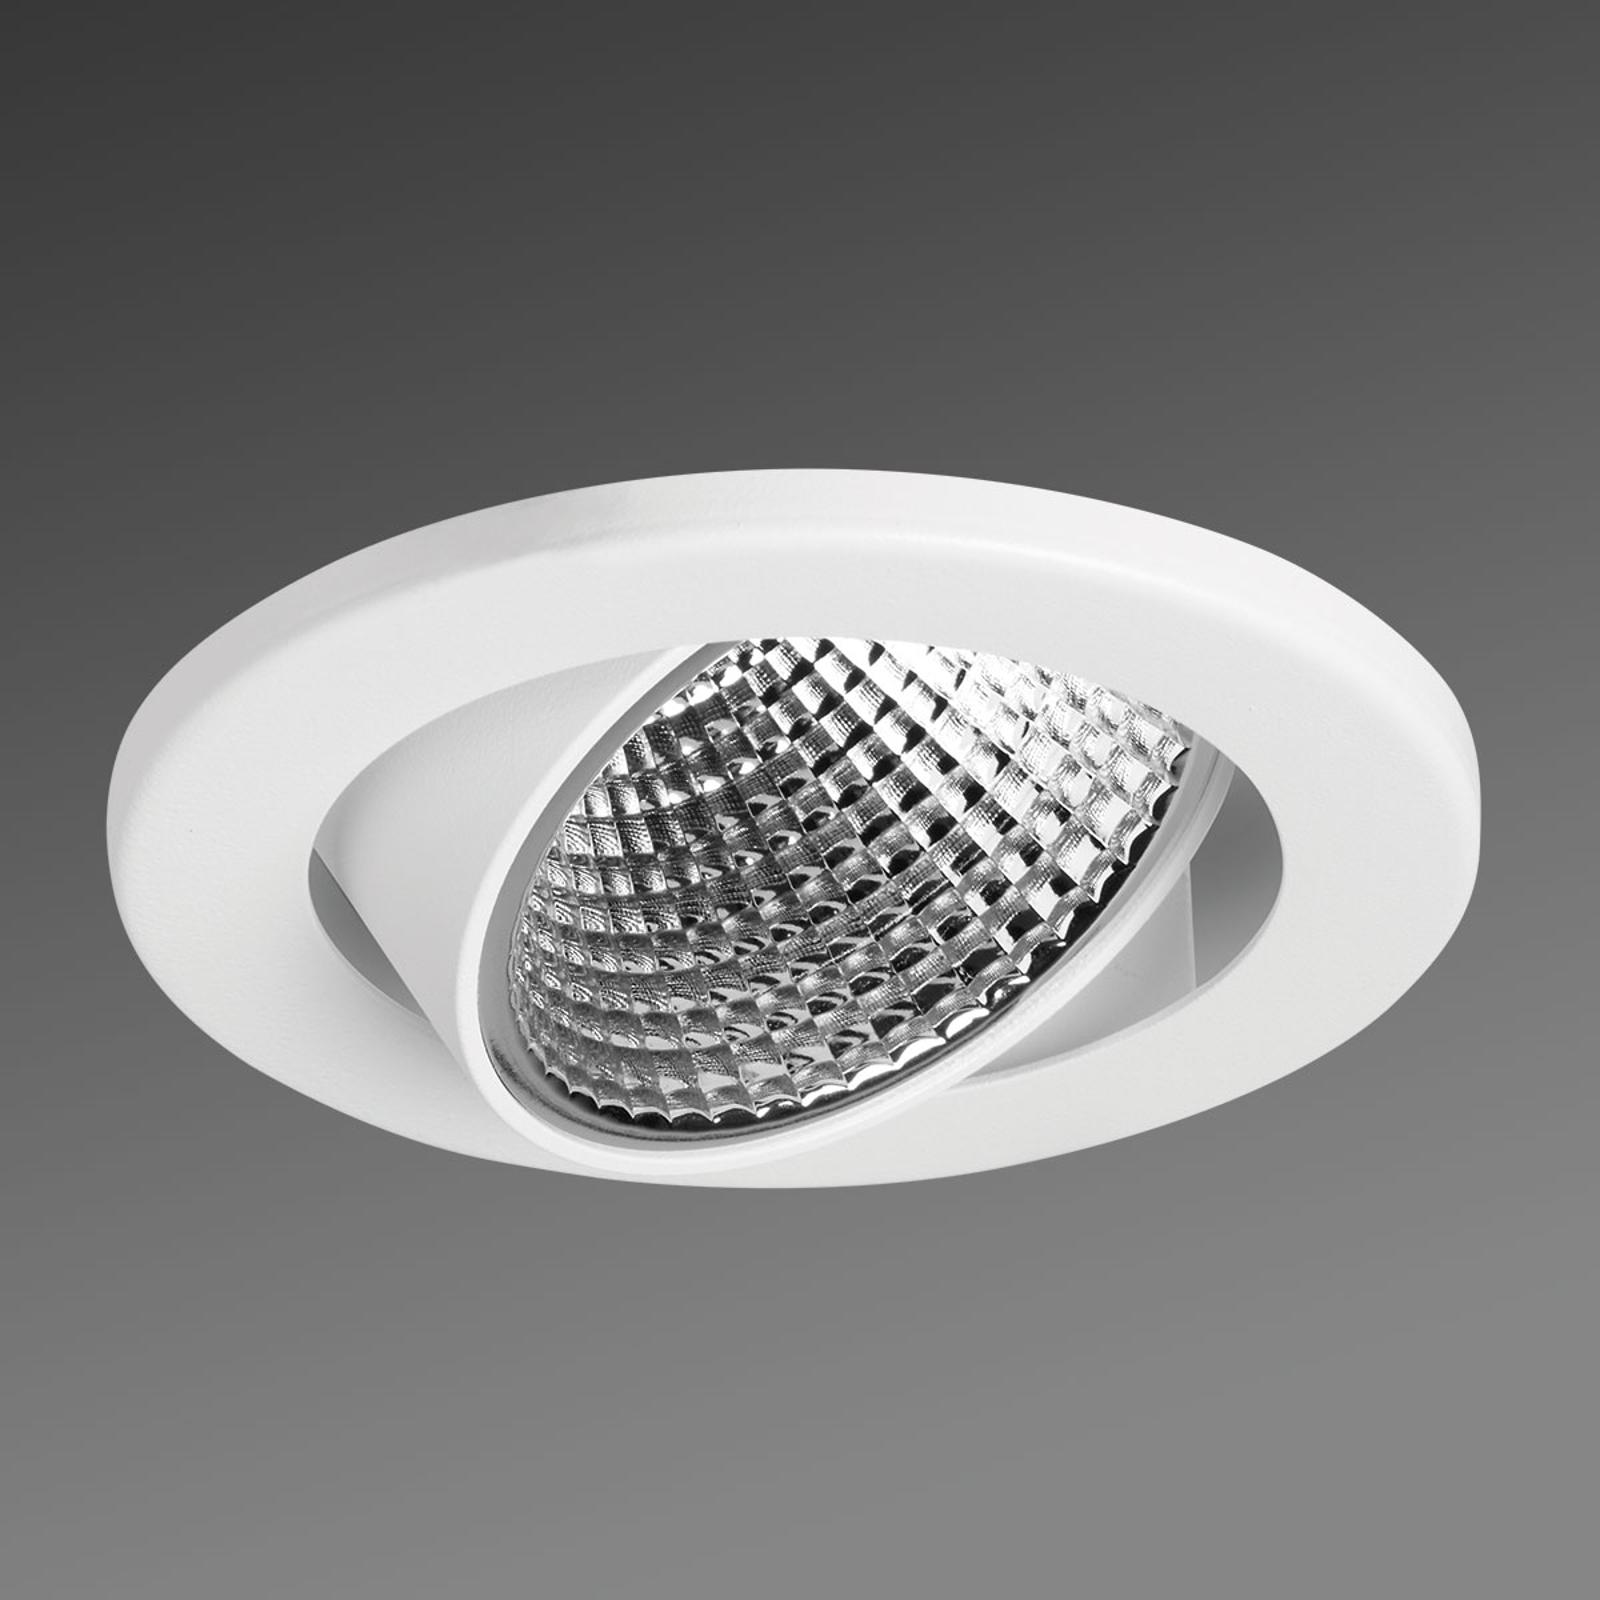 LED-Einbauspot Zipar Adjustable 12W 4.000K